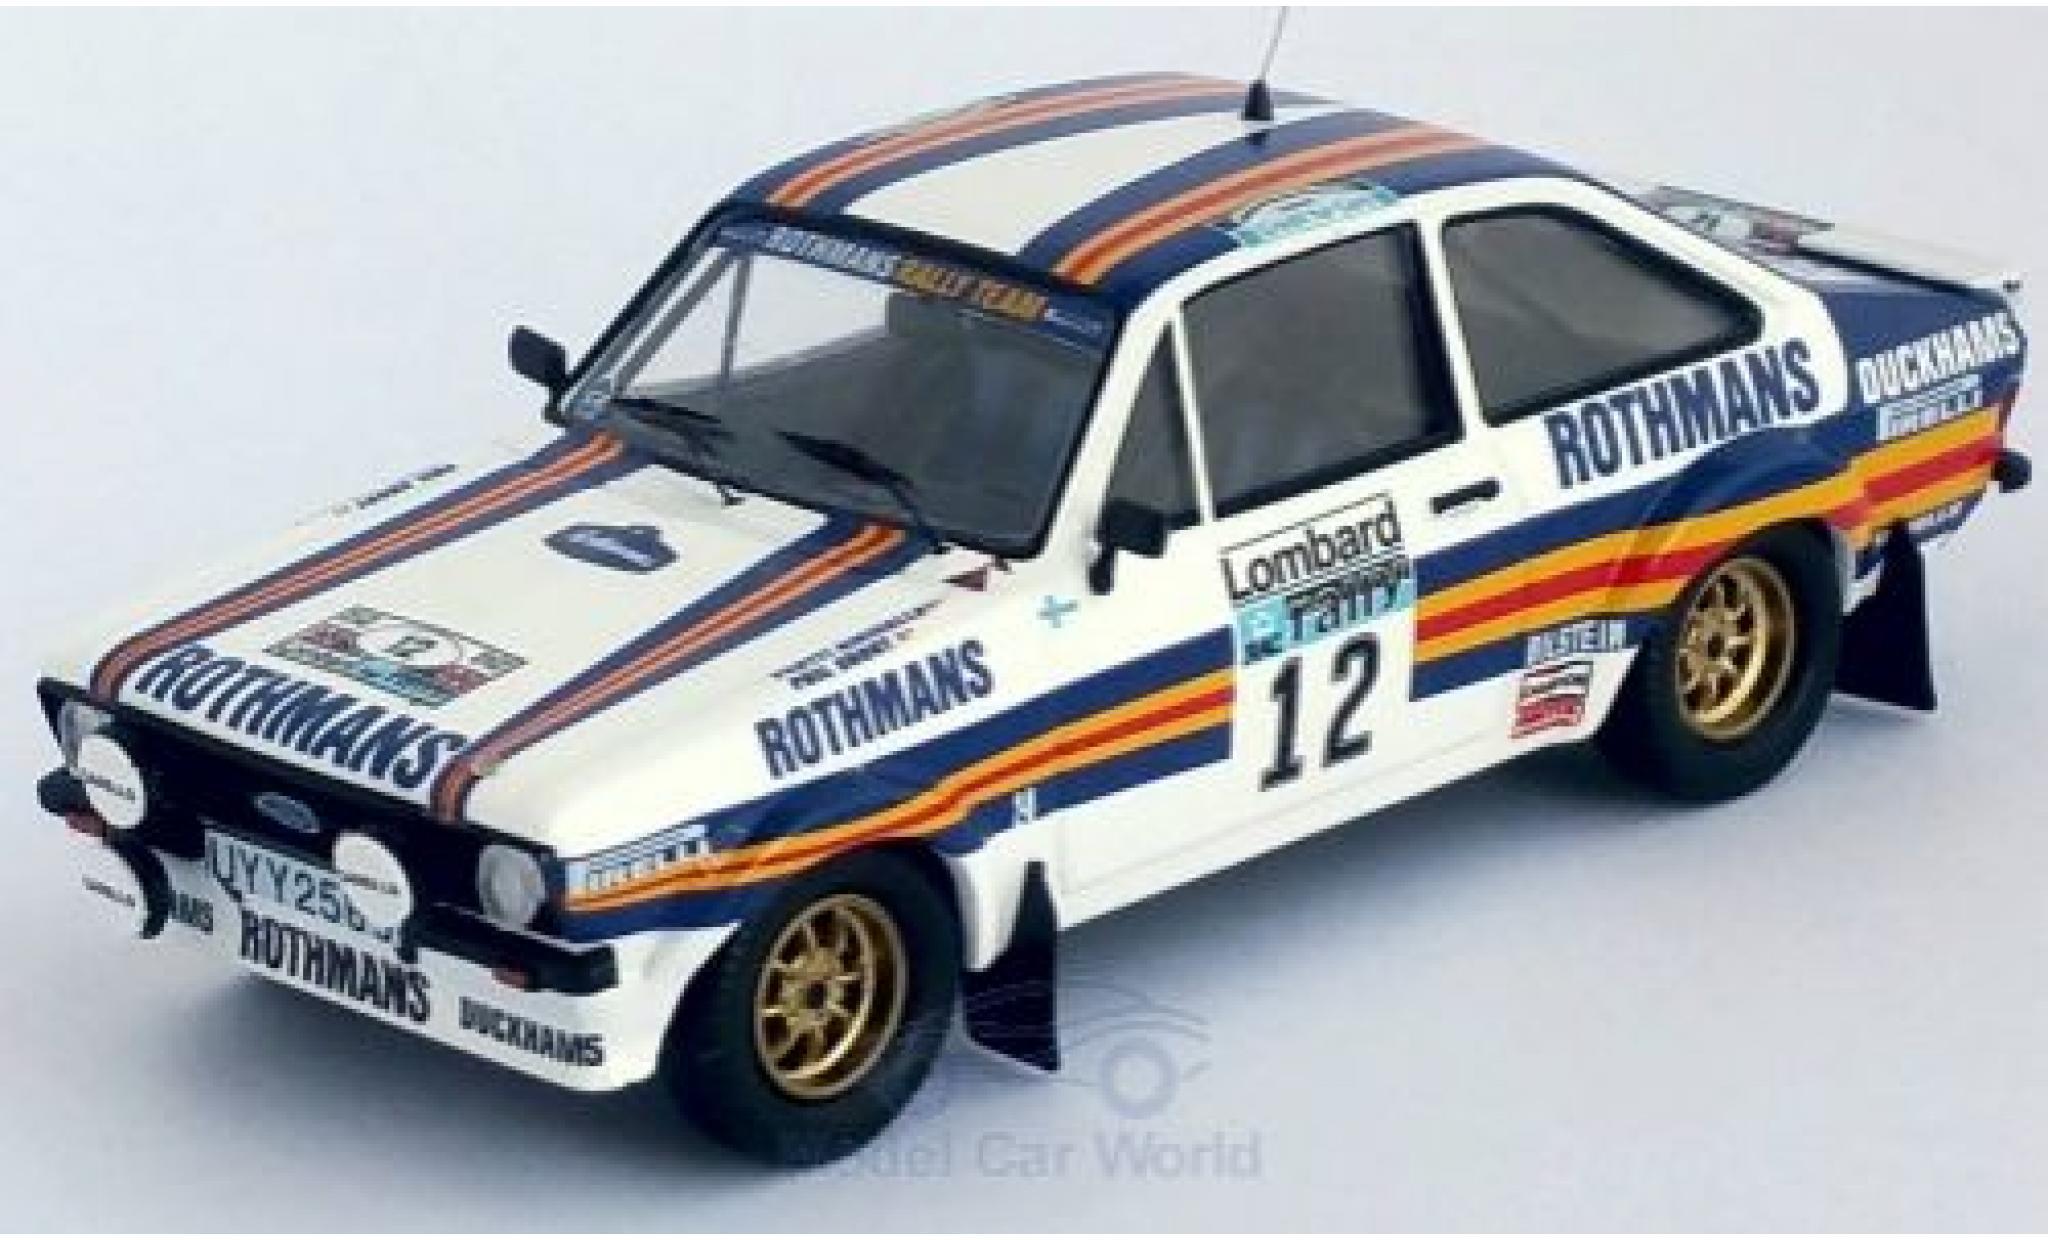 Ford Escort 1/43 Trofeu MK II RS No.12 Rothmans Rally Team Rothmans Rallye WM RAC Rallye 1981 P.Airikkala/P.Short